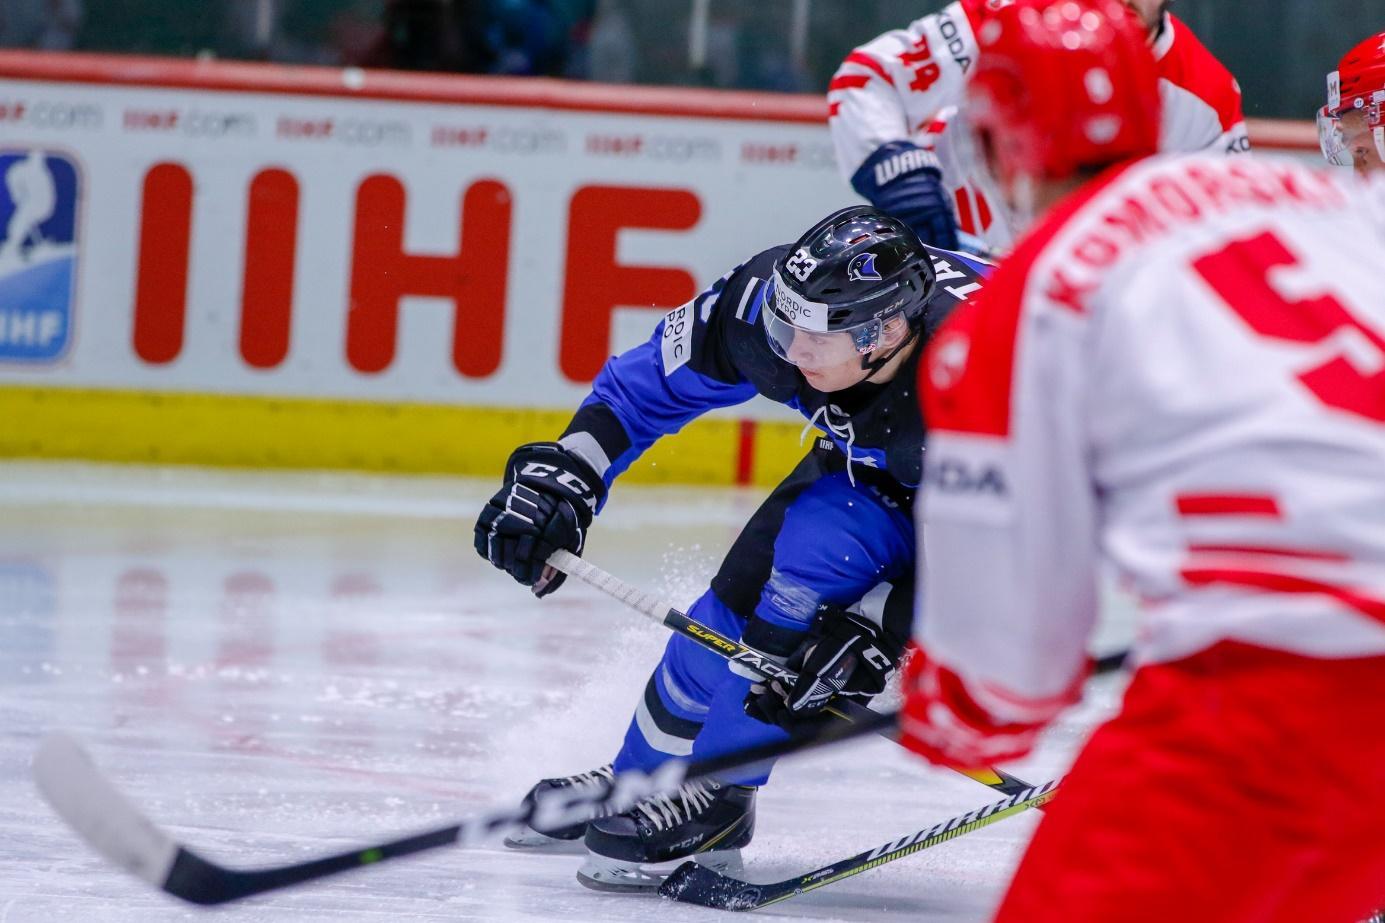 IIHF - Gallery: Estonia vs. Poland - 2019 IIHF Ice Hockey ...